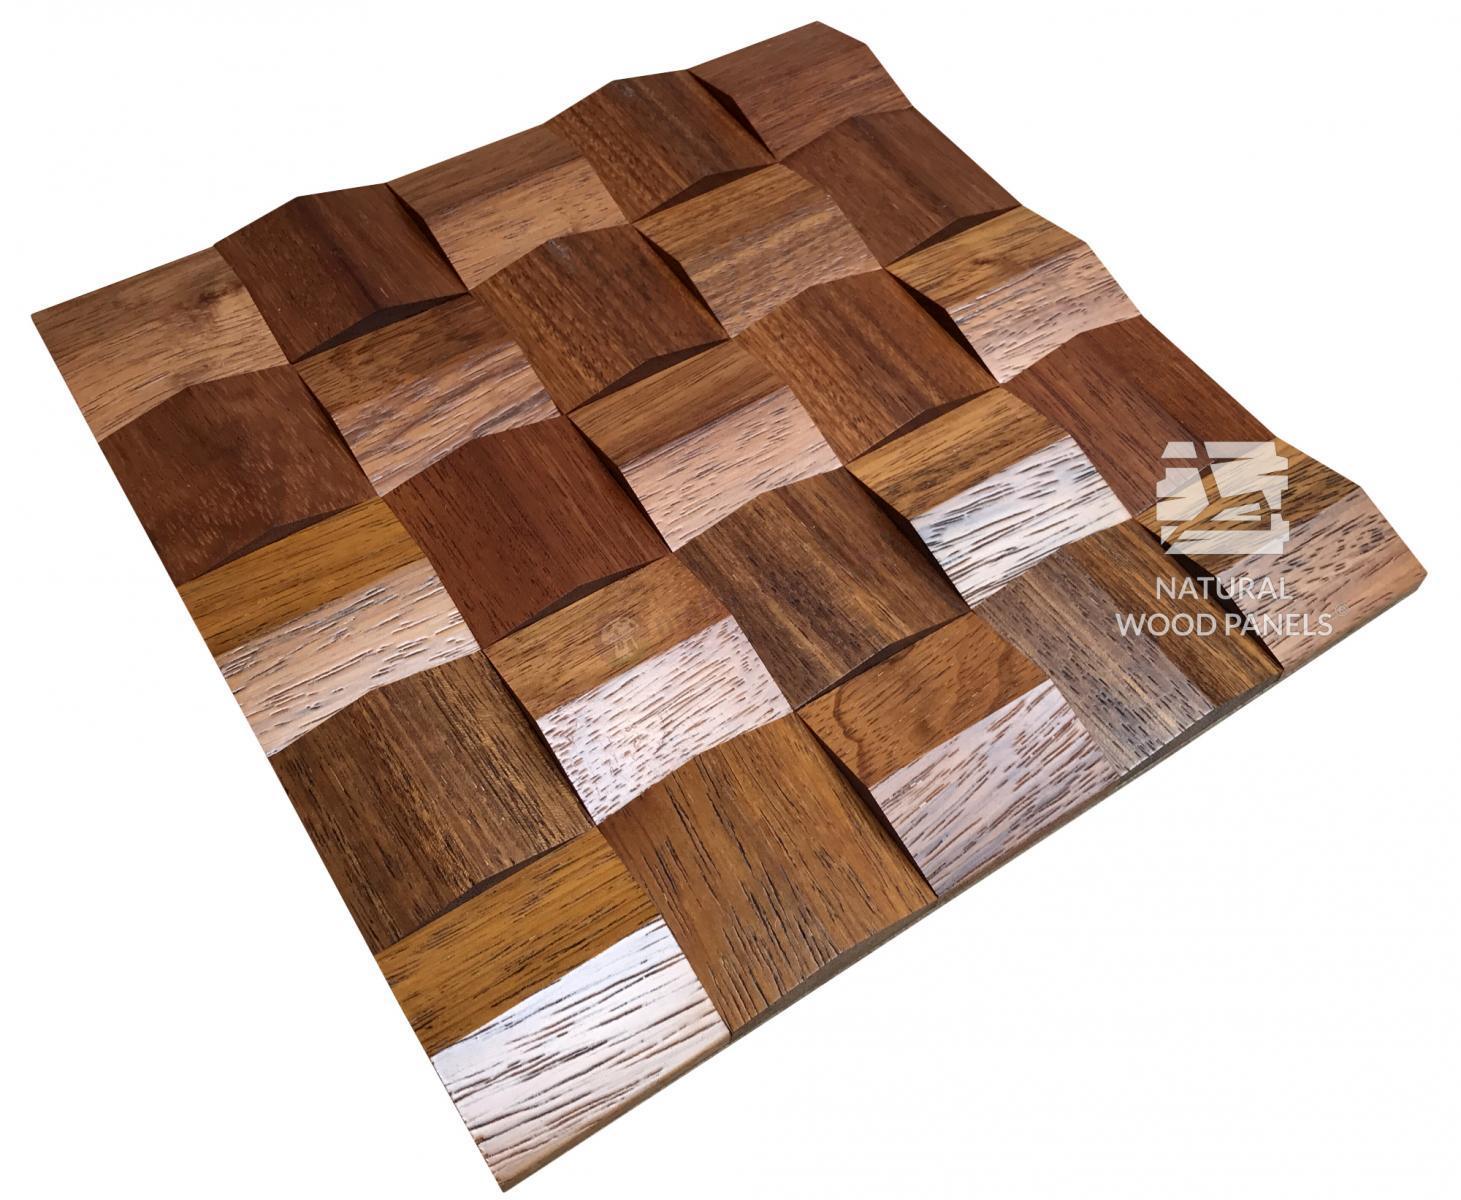 Panele Crystal  series – Merbay *084 - Natural Wood Panels